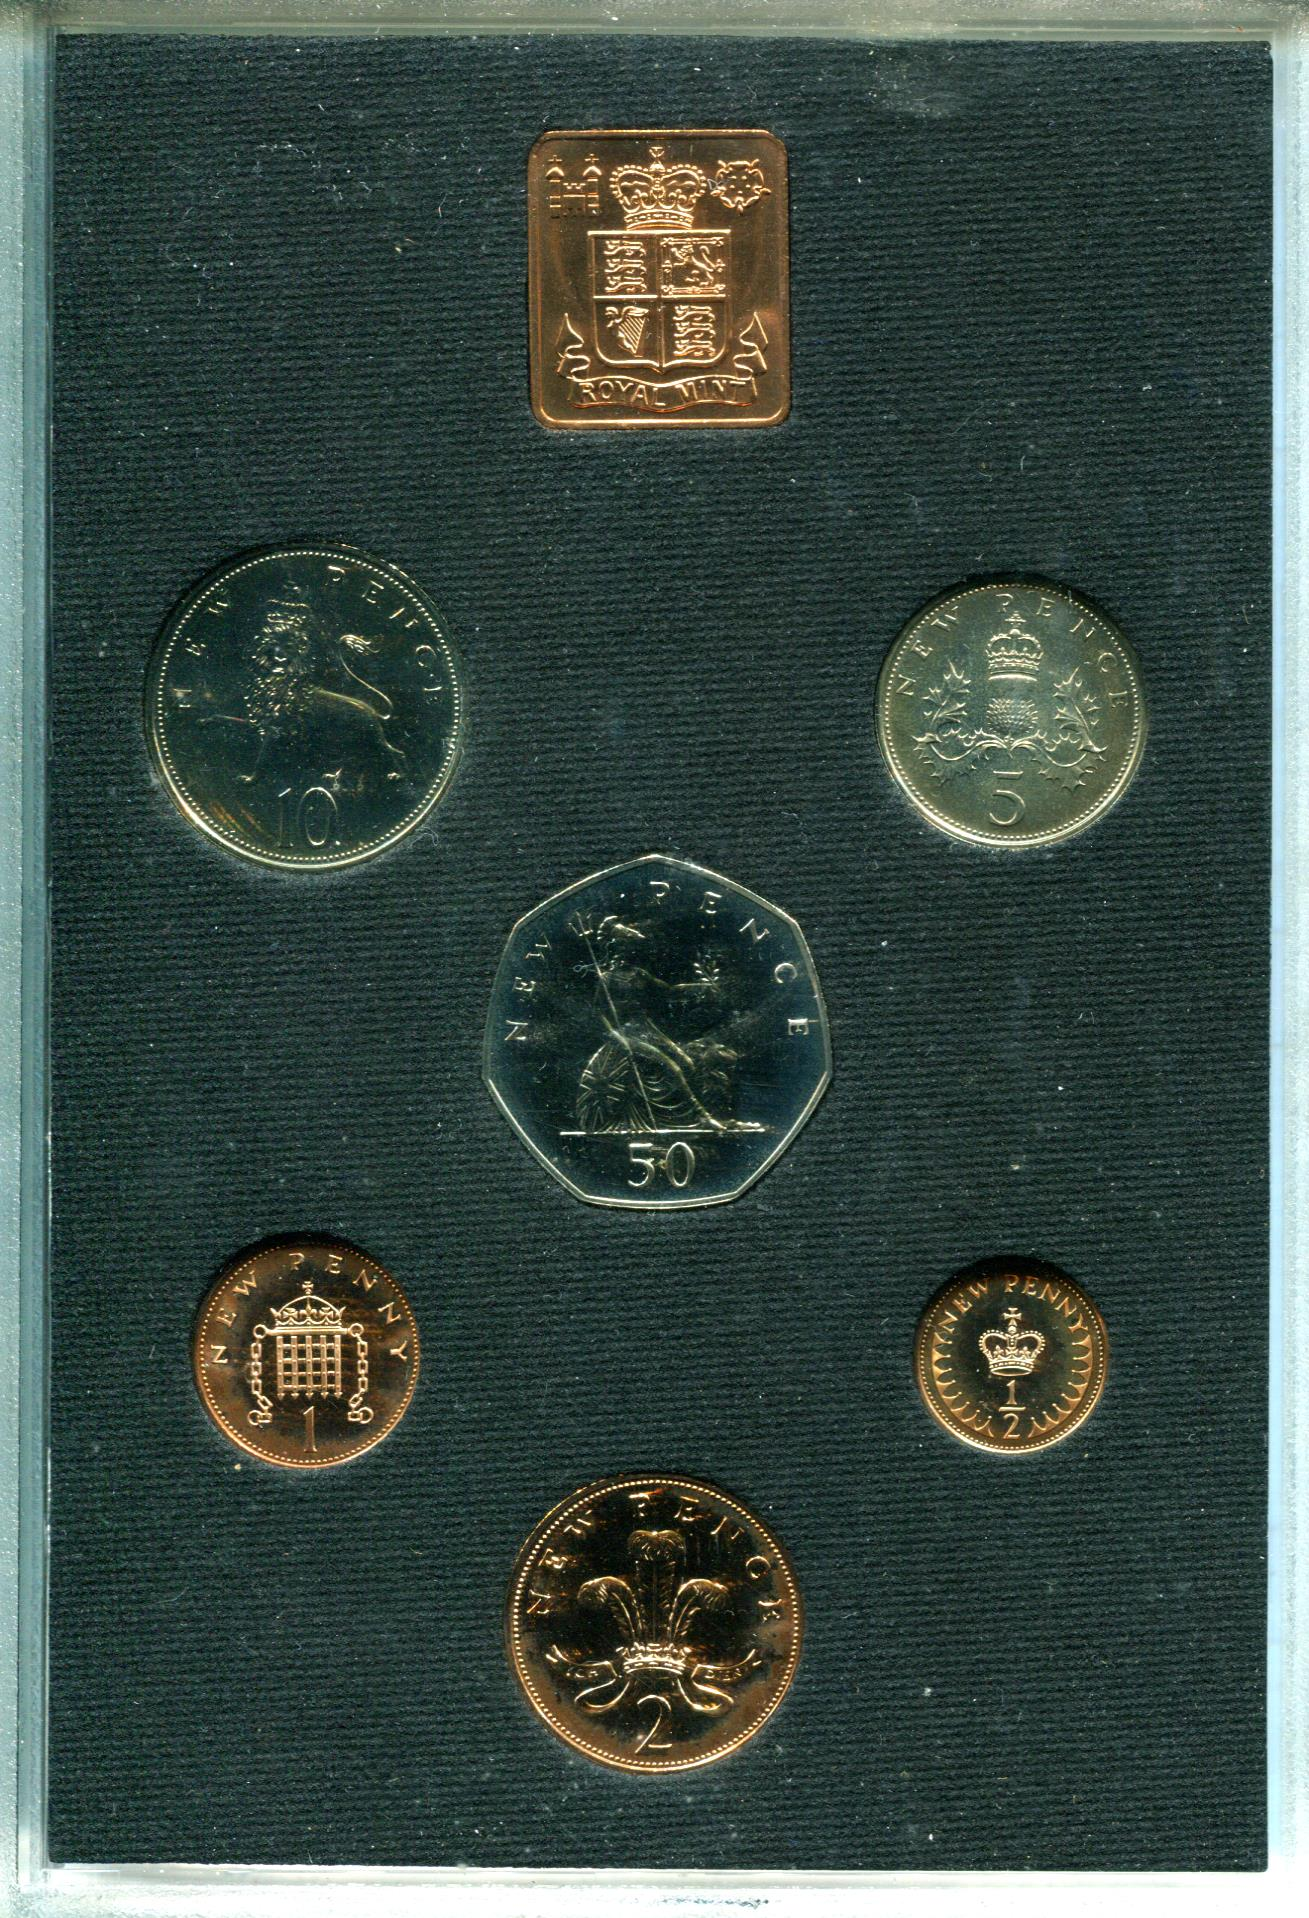 18th century coin value